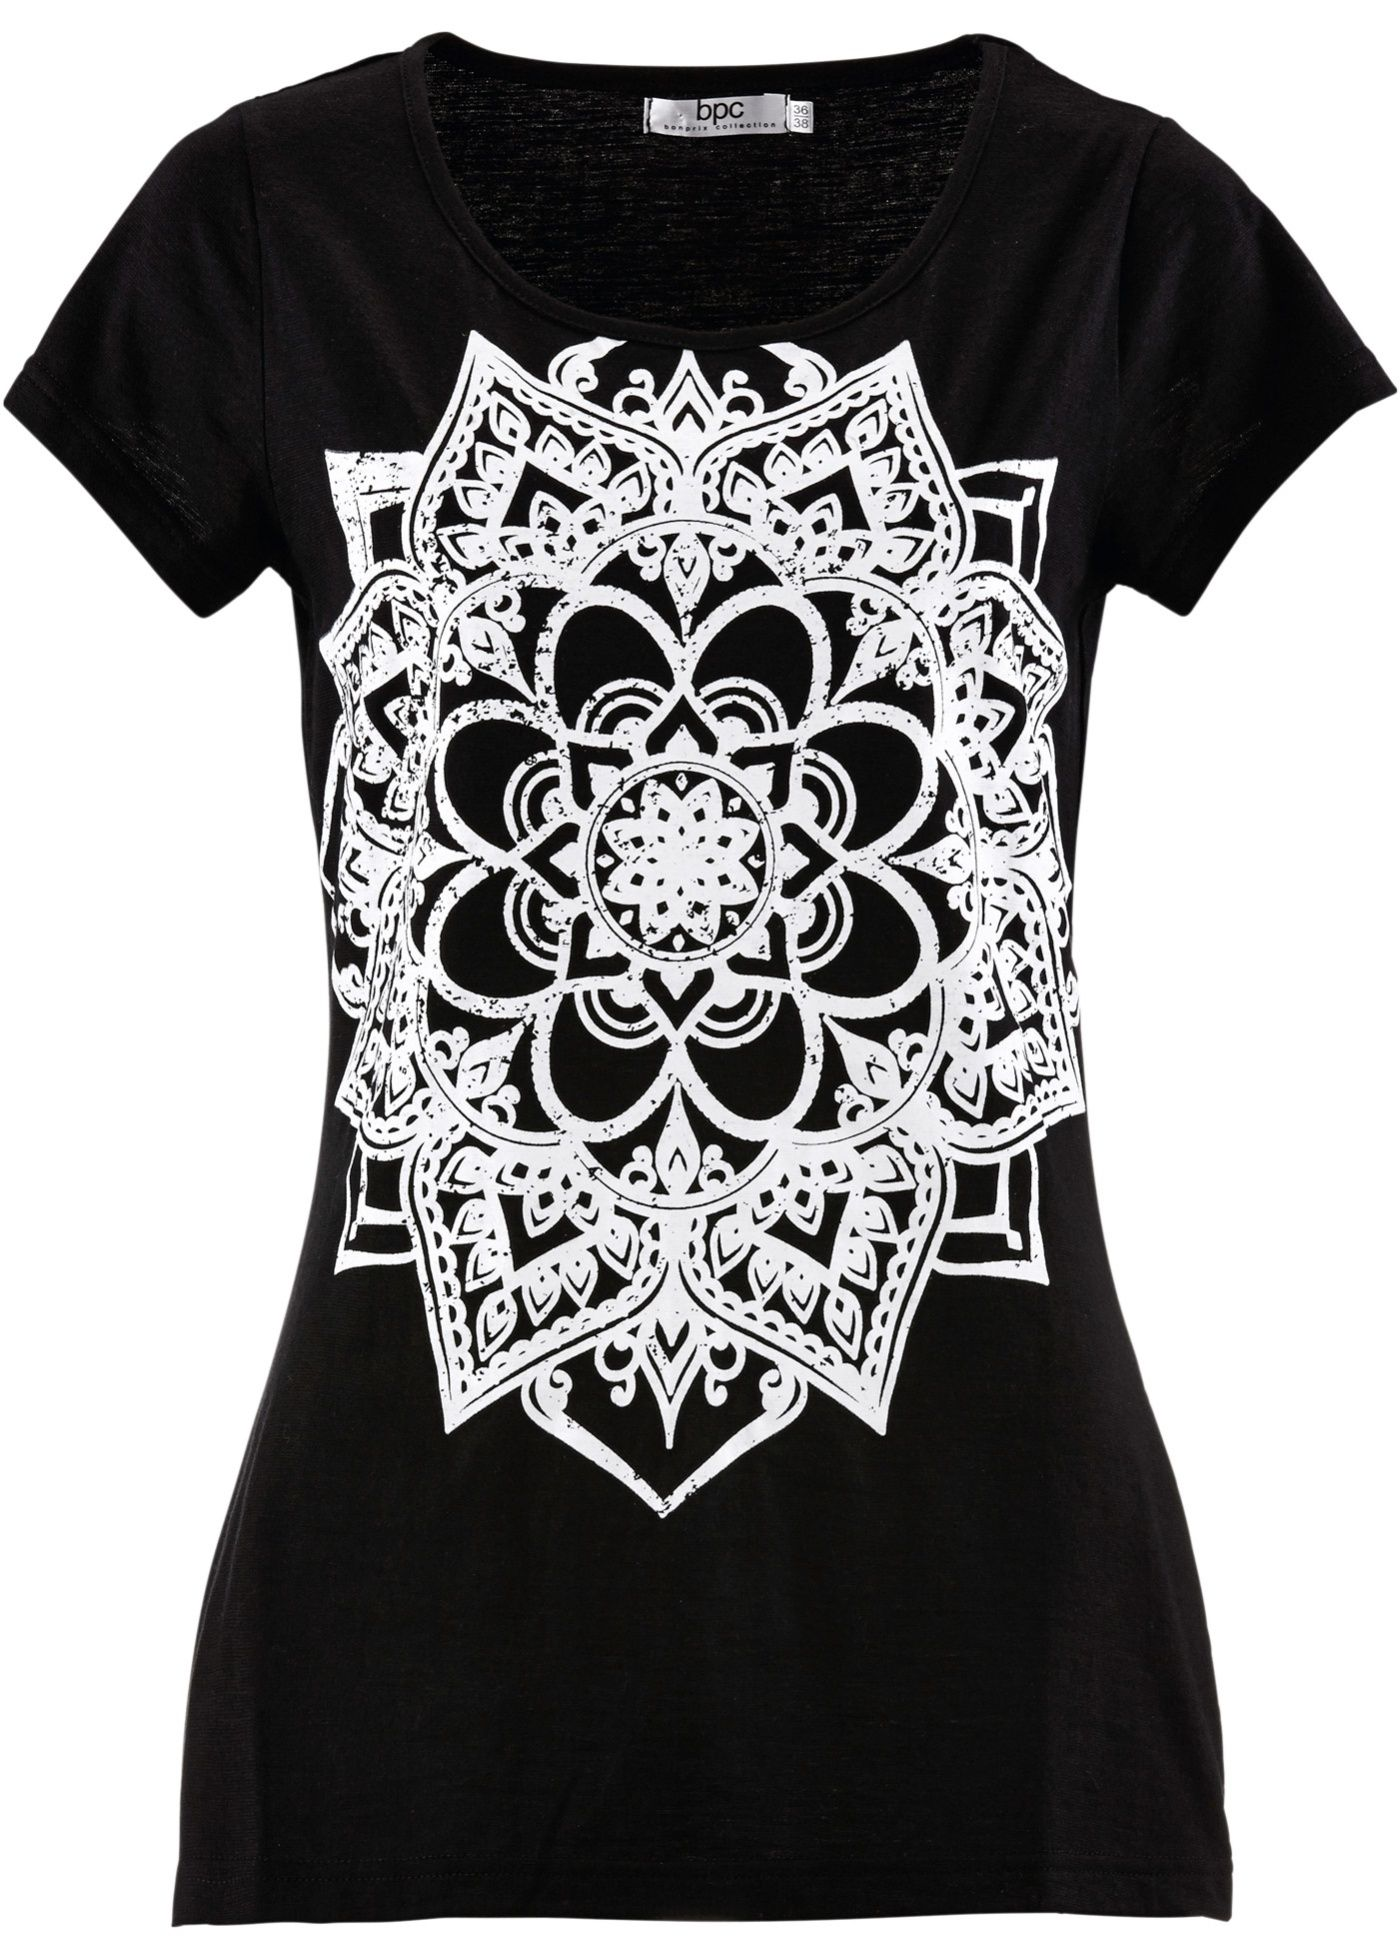 Flammgarn-Shirt mit kurzen Ärmeln